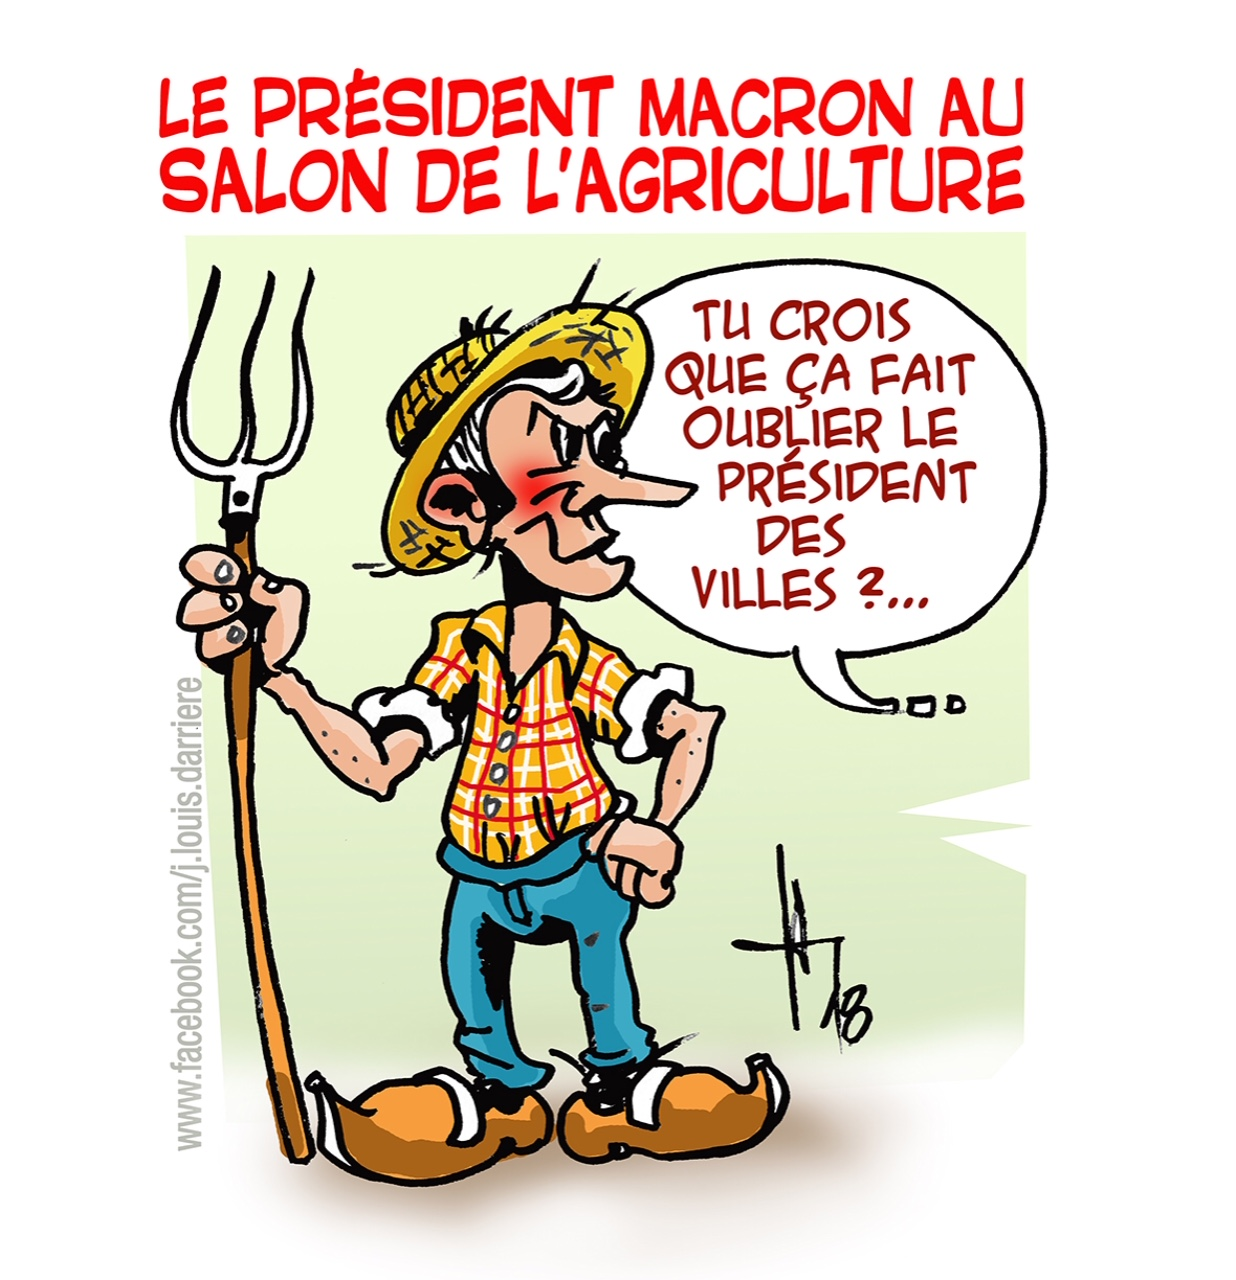 Le reboussier 02 18 for Macron salon agriculture oeuf